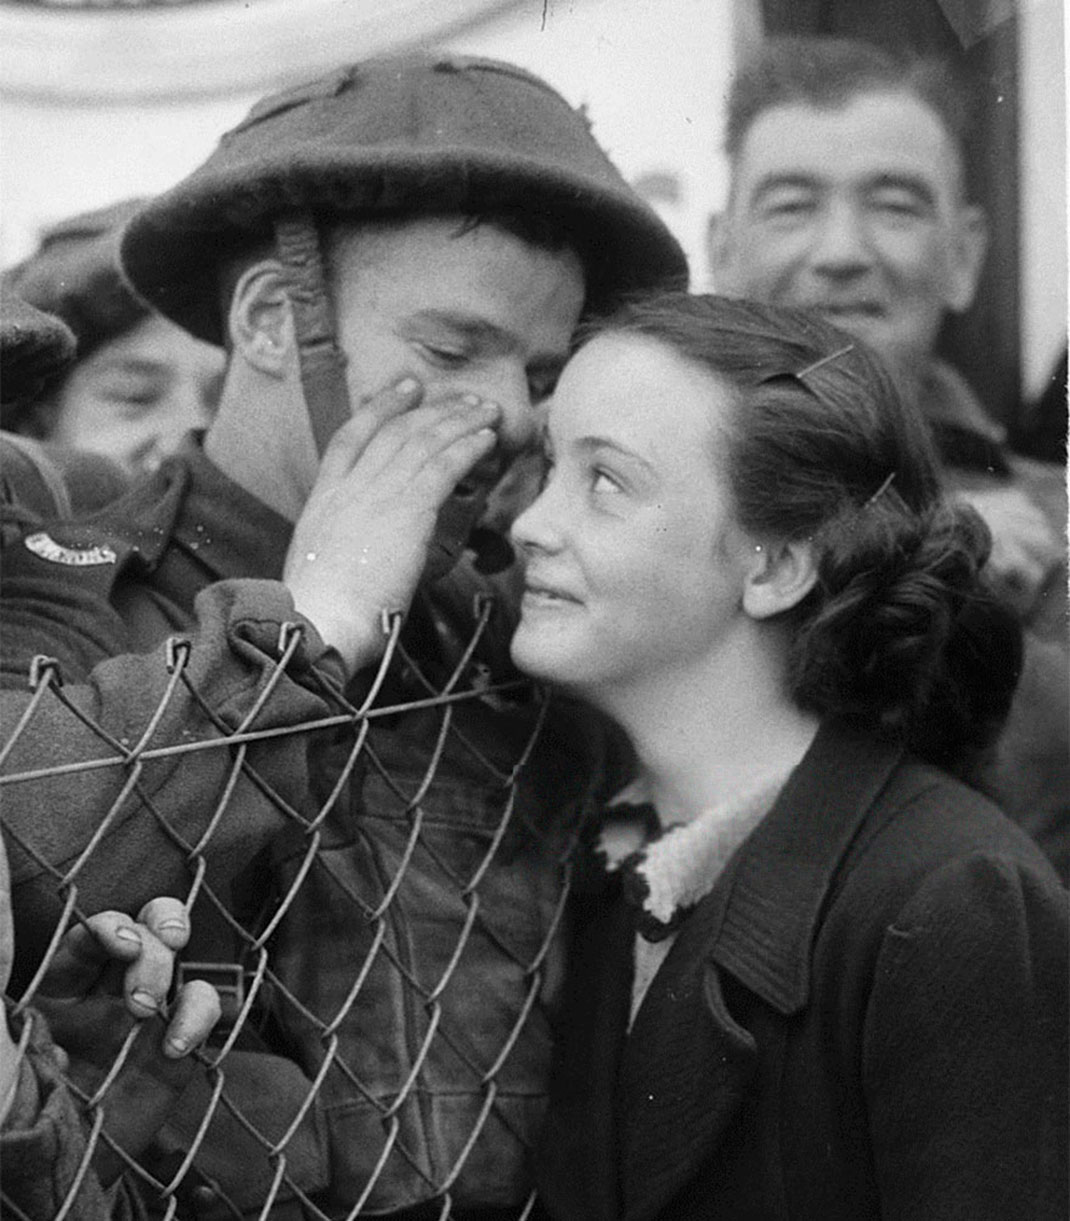 baiser-guerre-soldats-16